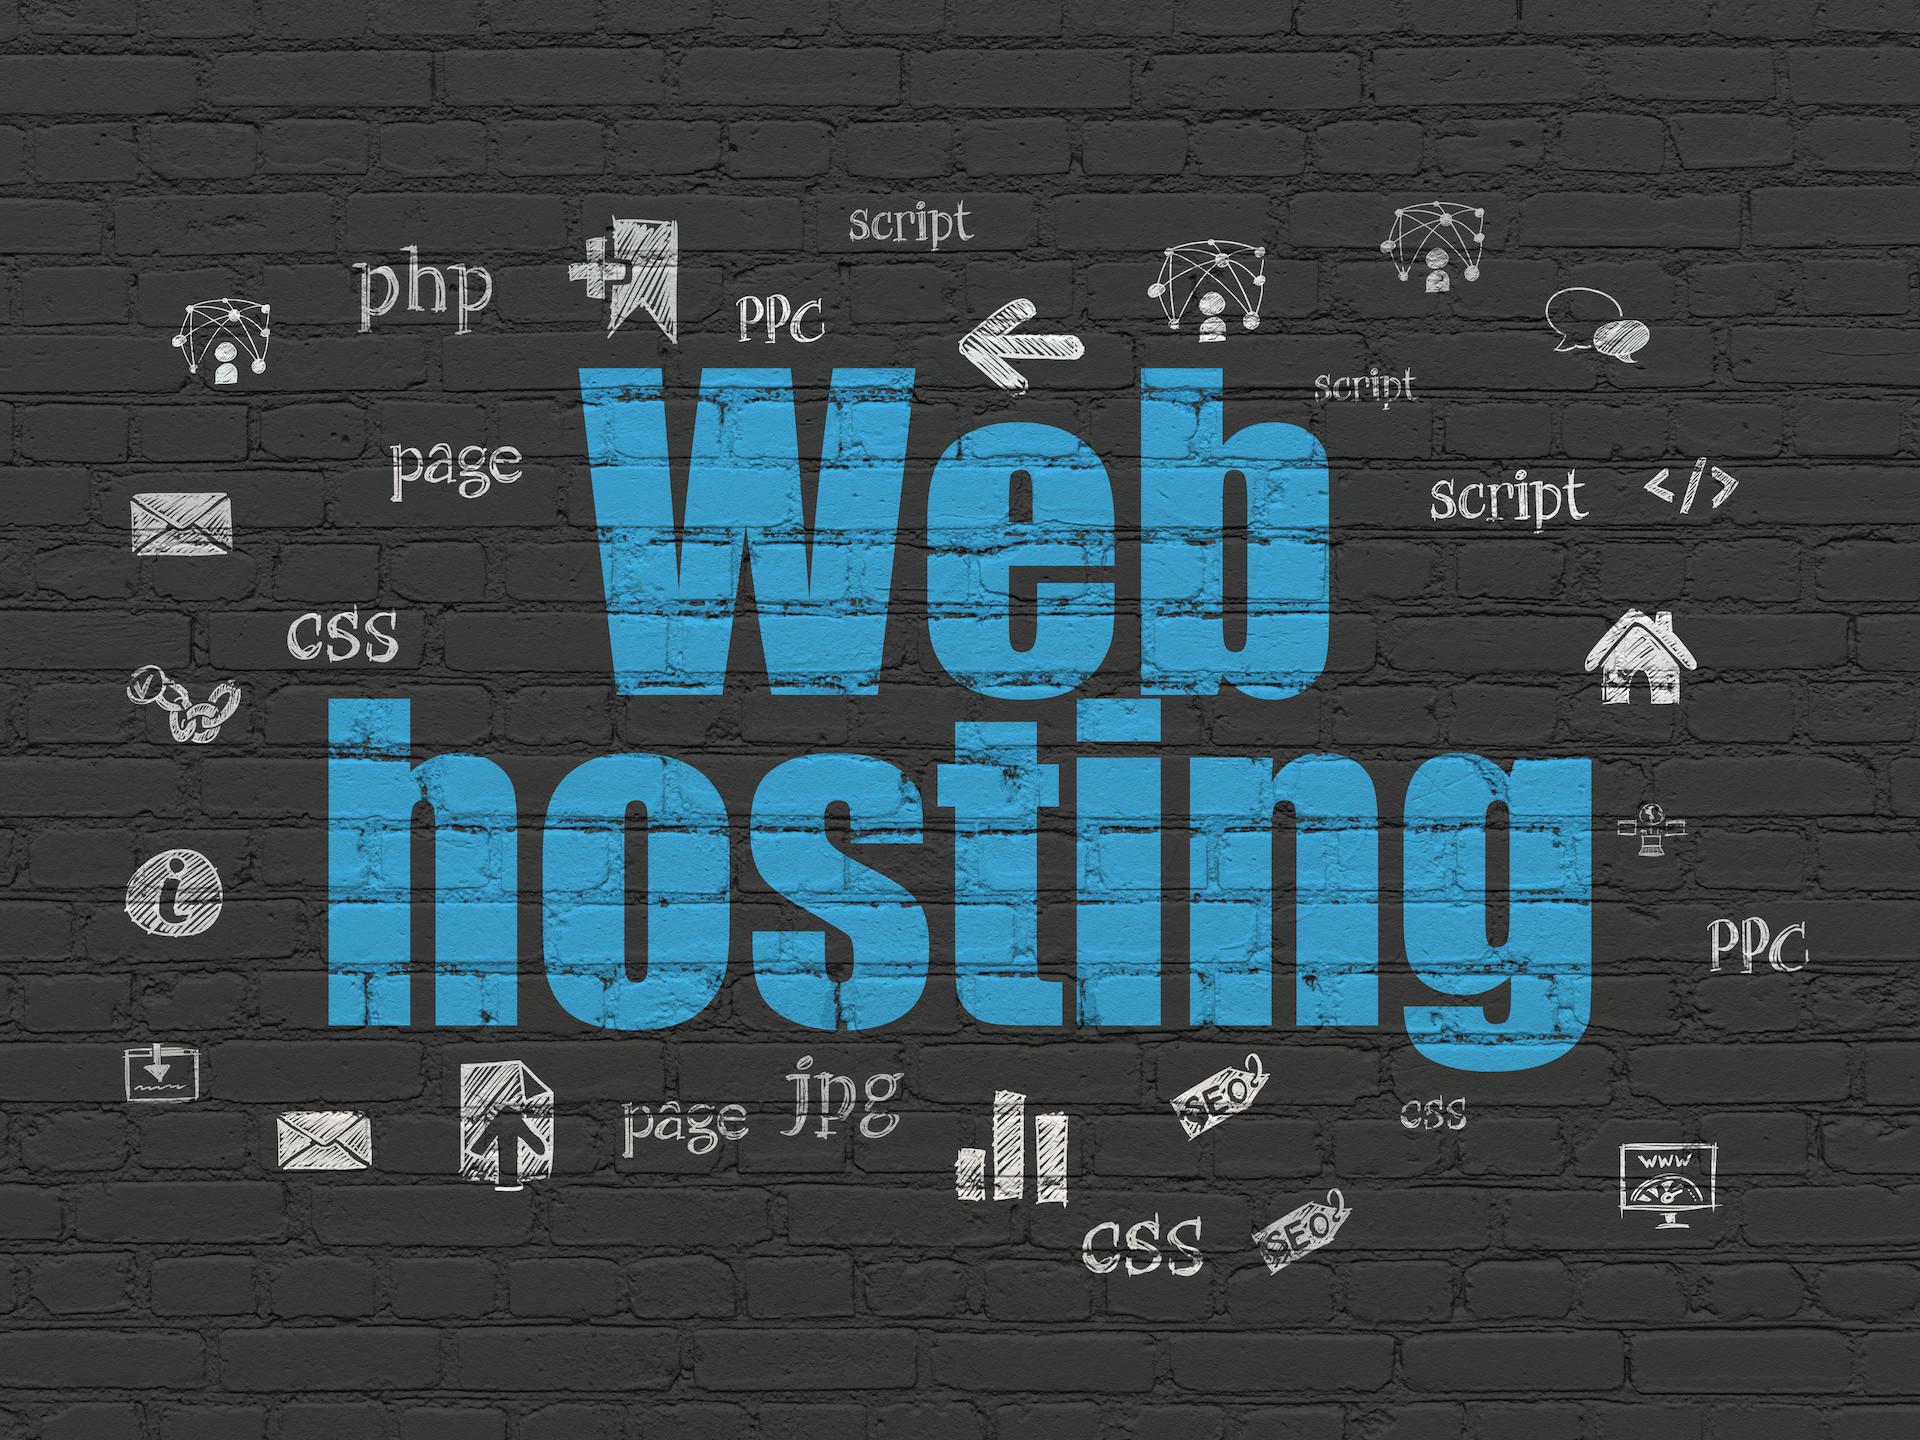 web hosting wall - Blog 2